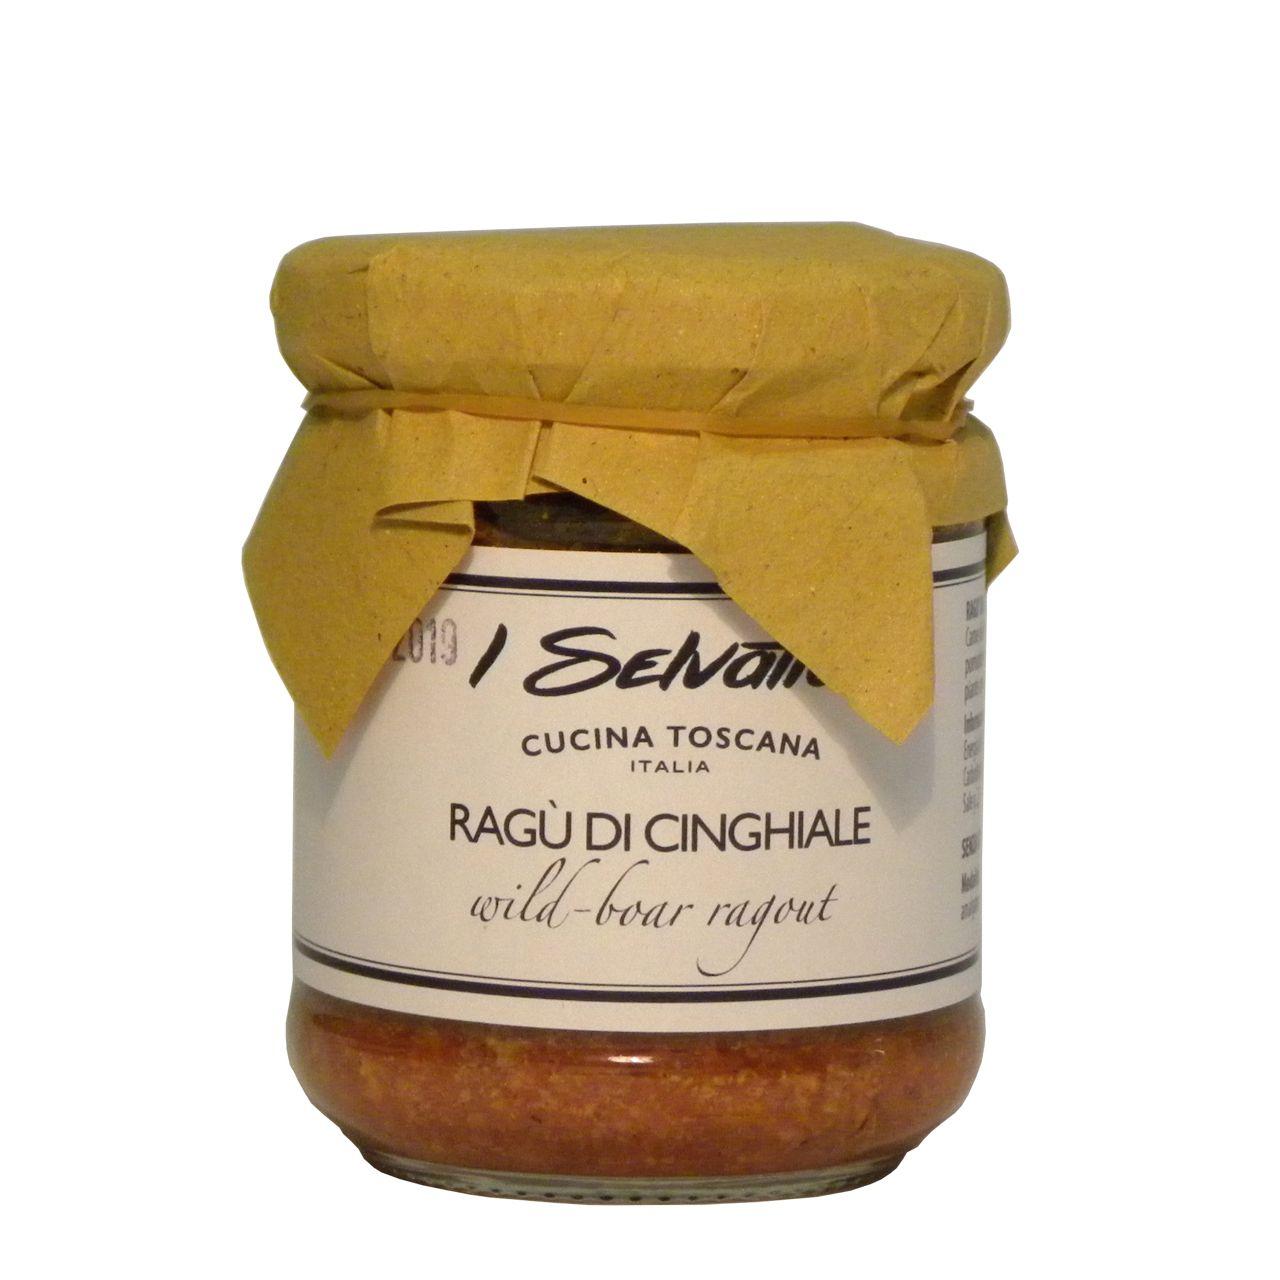 Ragù cinghiale Toscana – Tuscany wild boar ragù – Gustorotondo – Italian Food Boutique